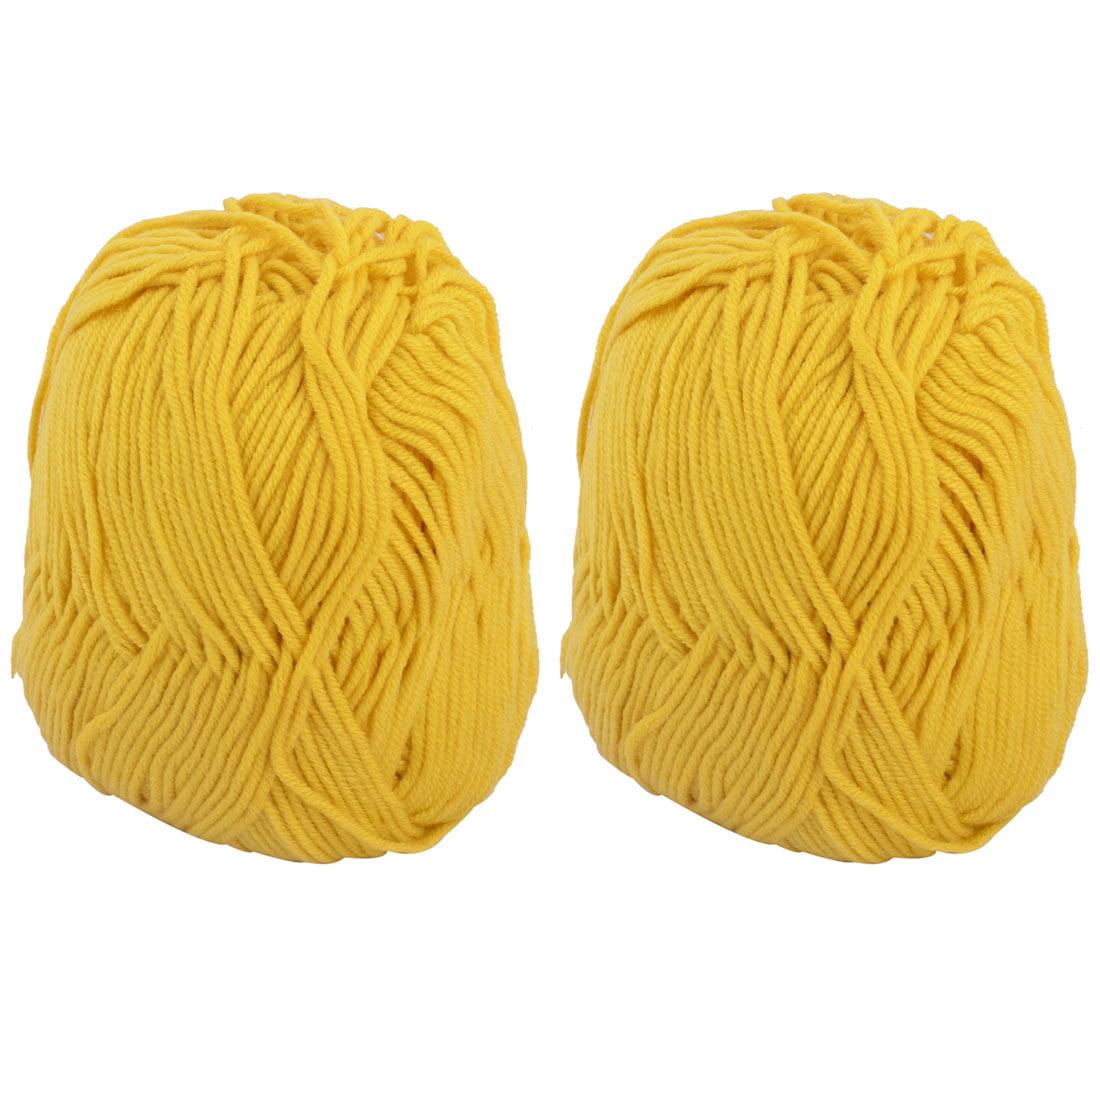 DIY Shawl Scarf Hat Glove Cord Tatting Knitting Weaving Yarn Yellow 100g 2pcs - image 3 of 3